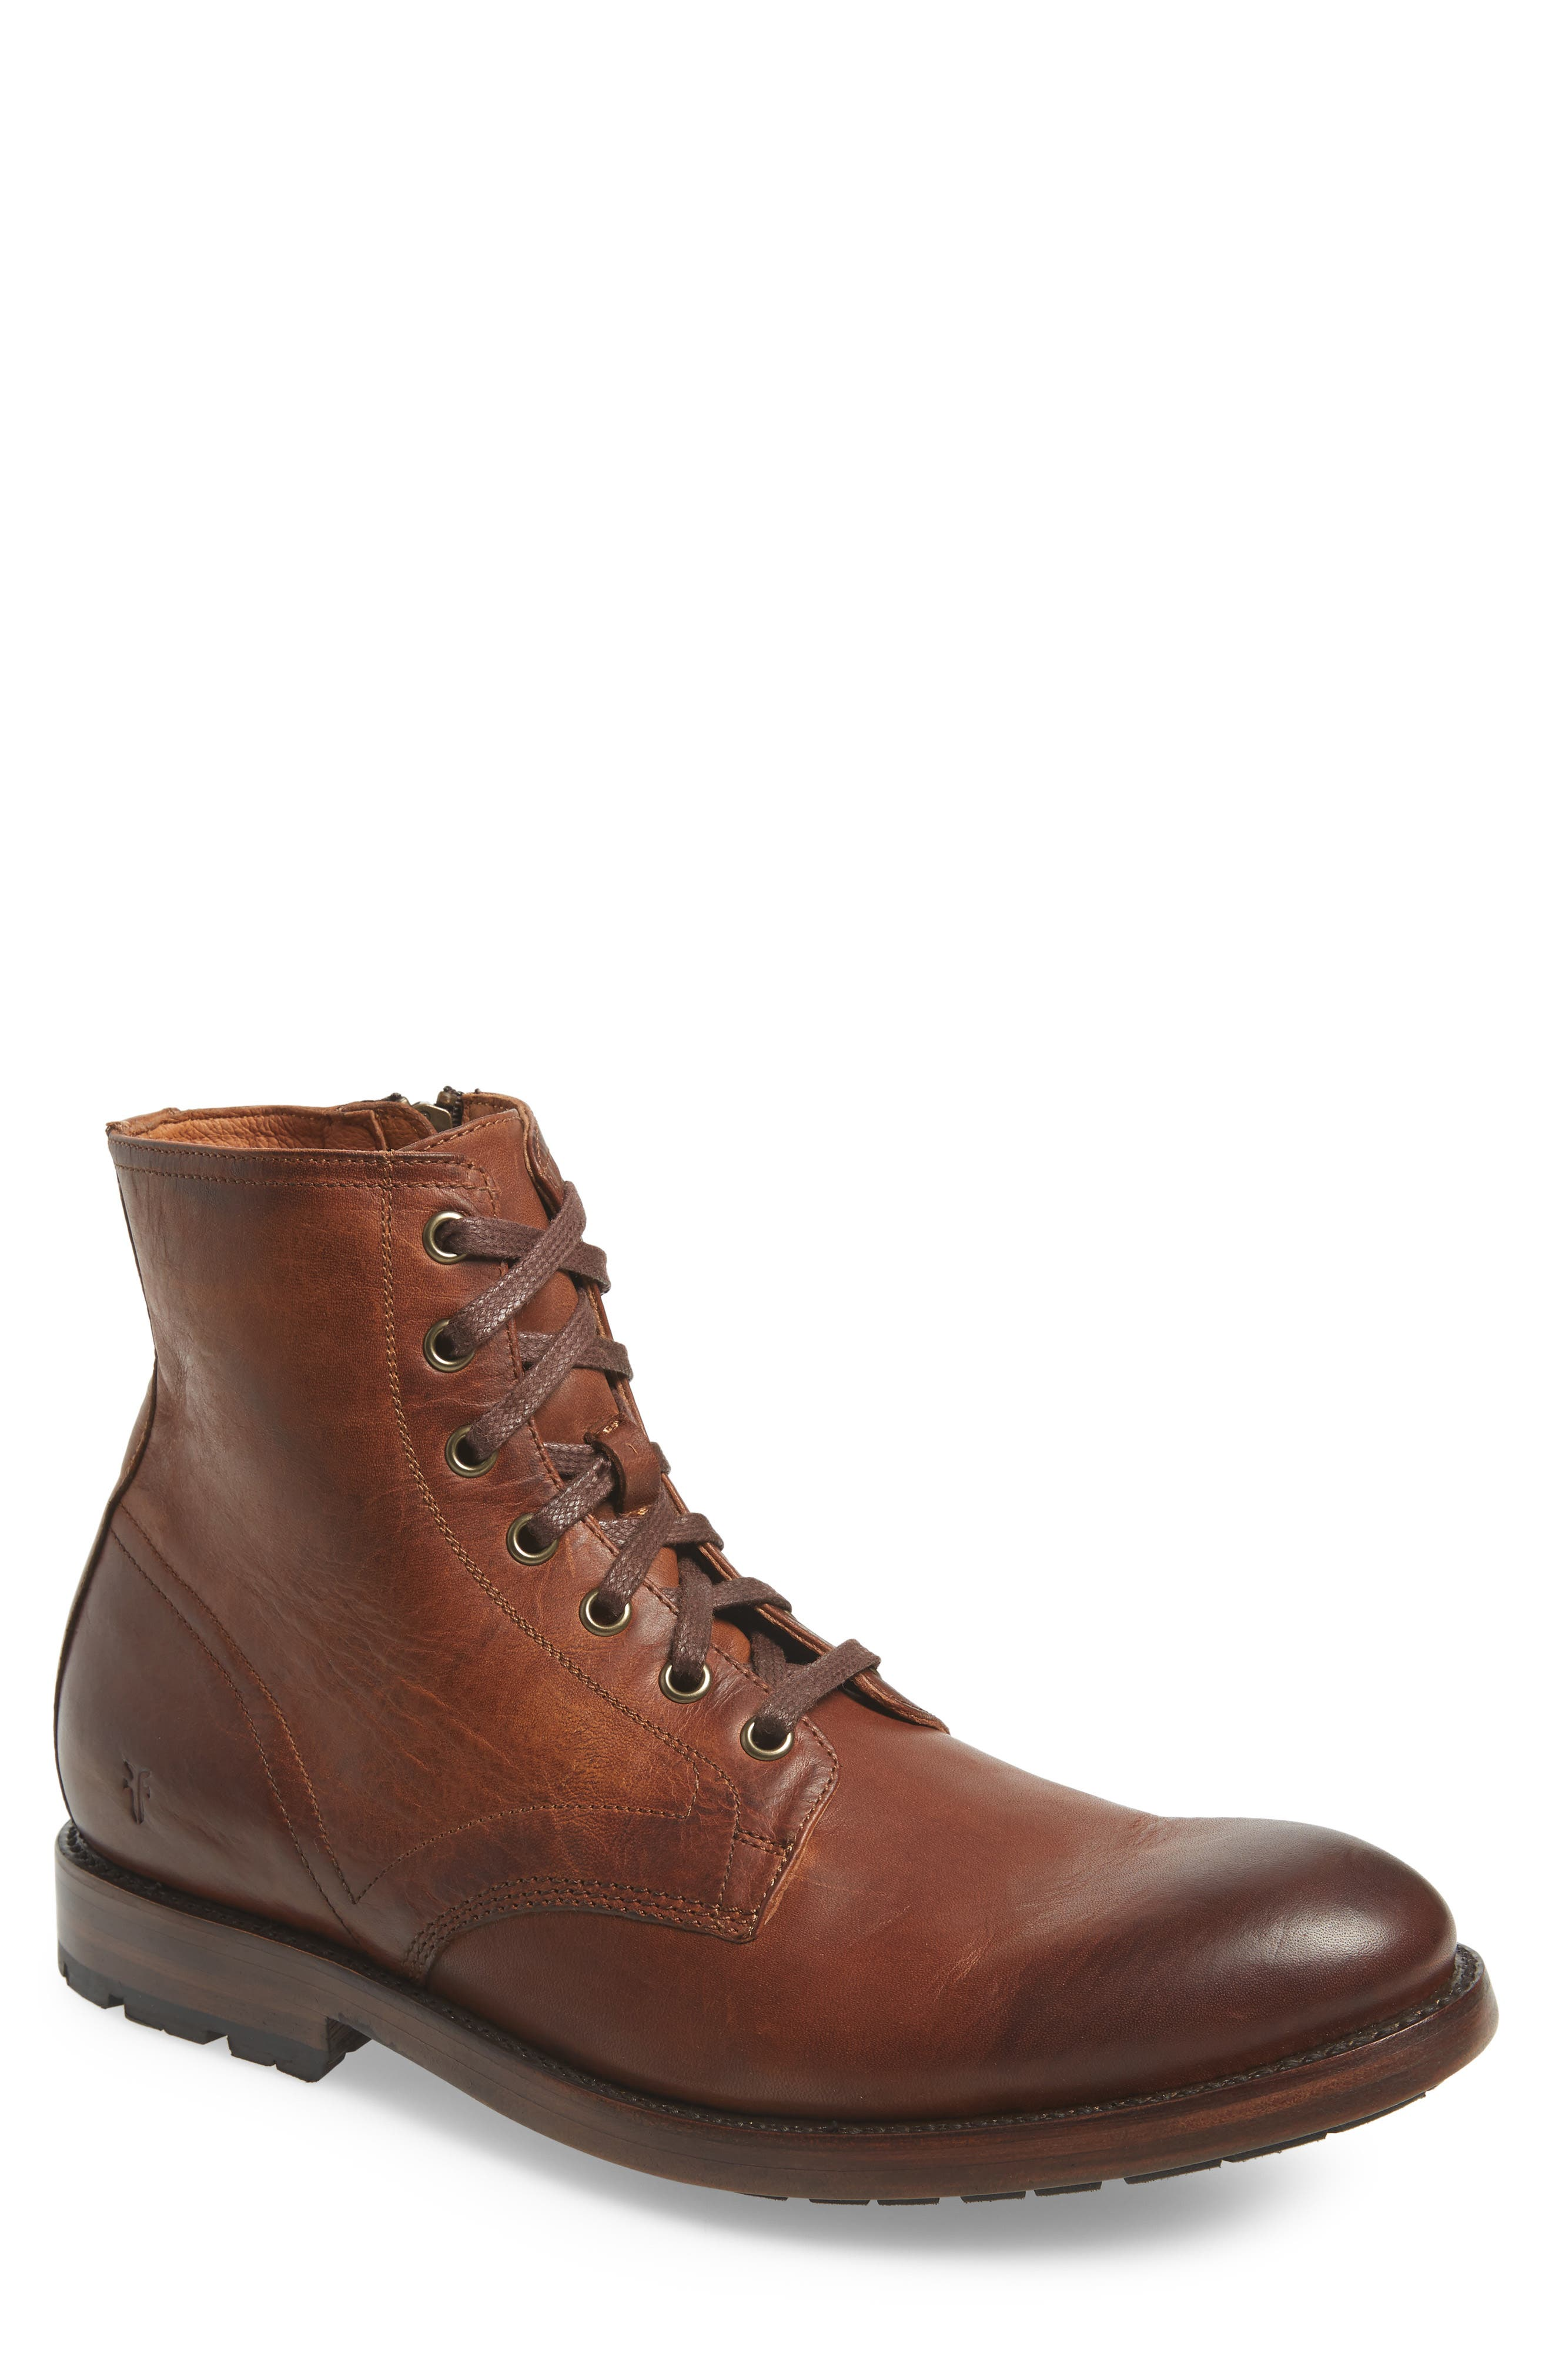 Bowery Plain Toe Boot,                         Main,                         color, COGNAC